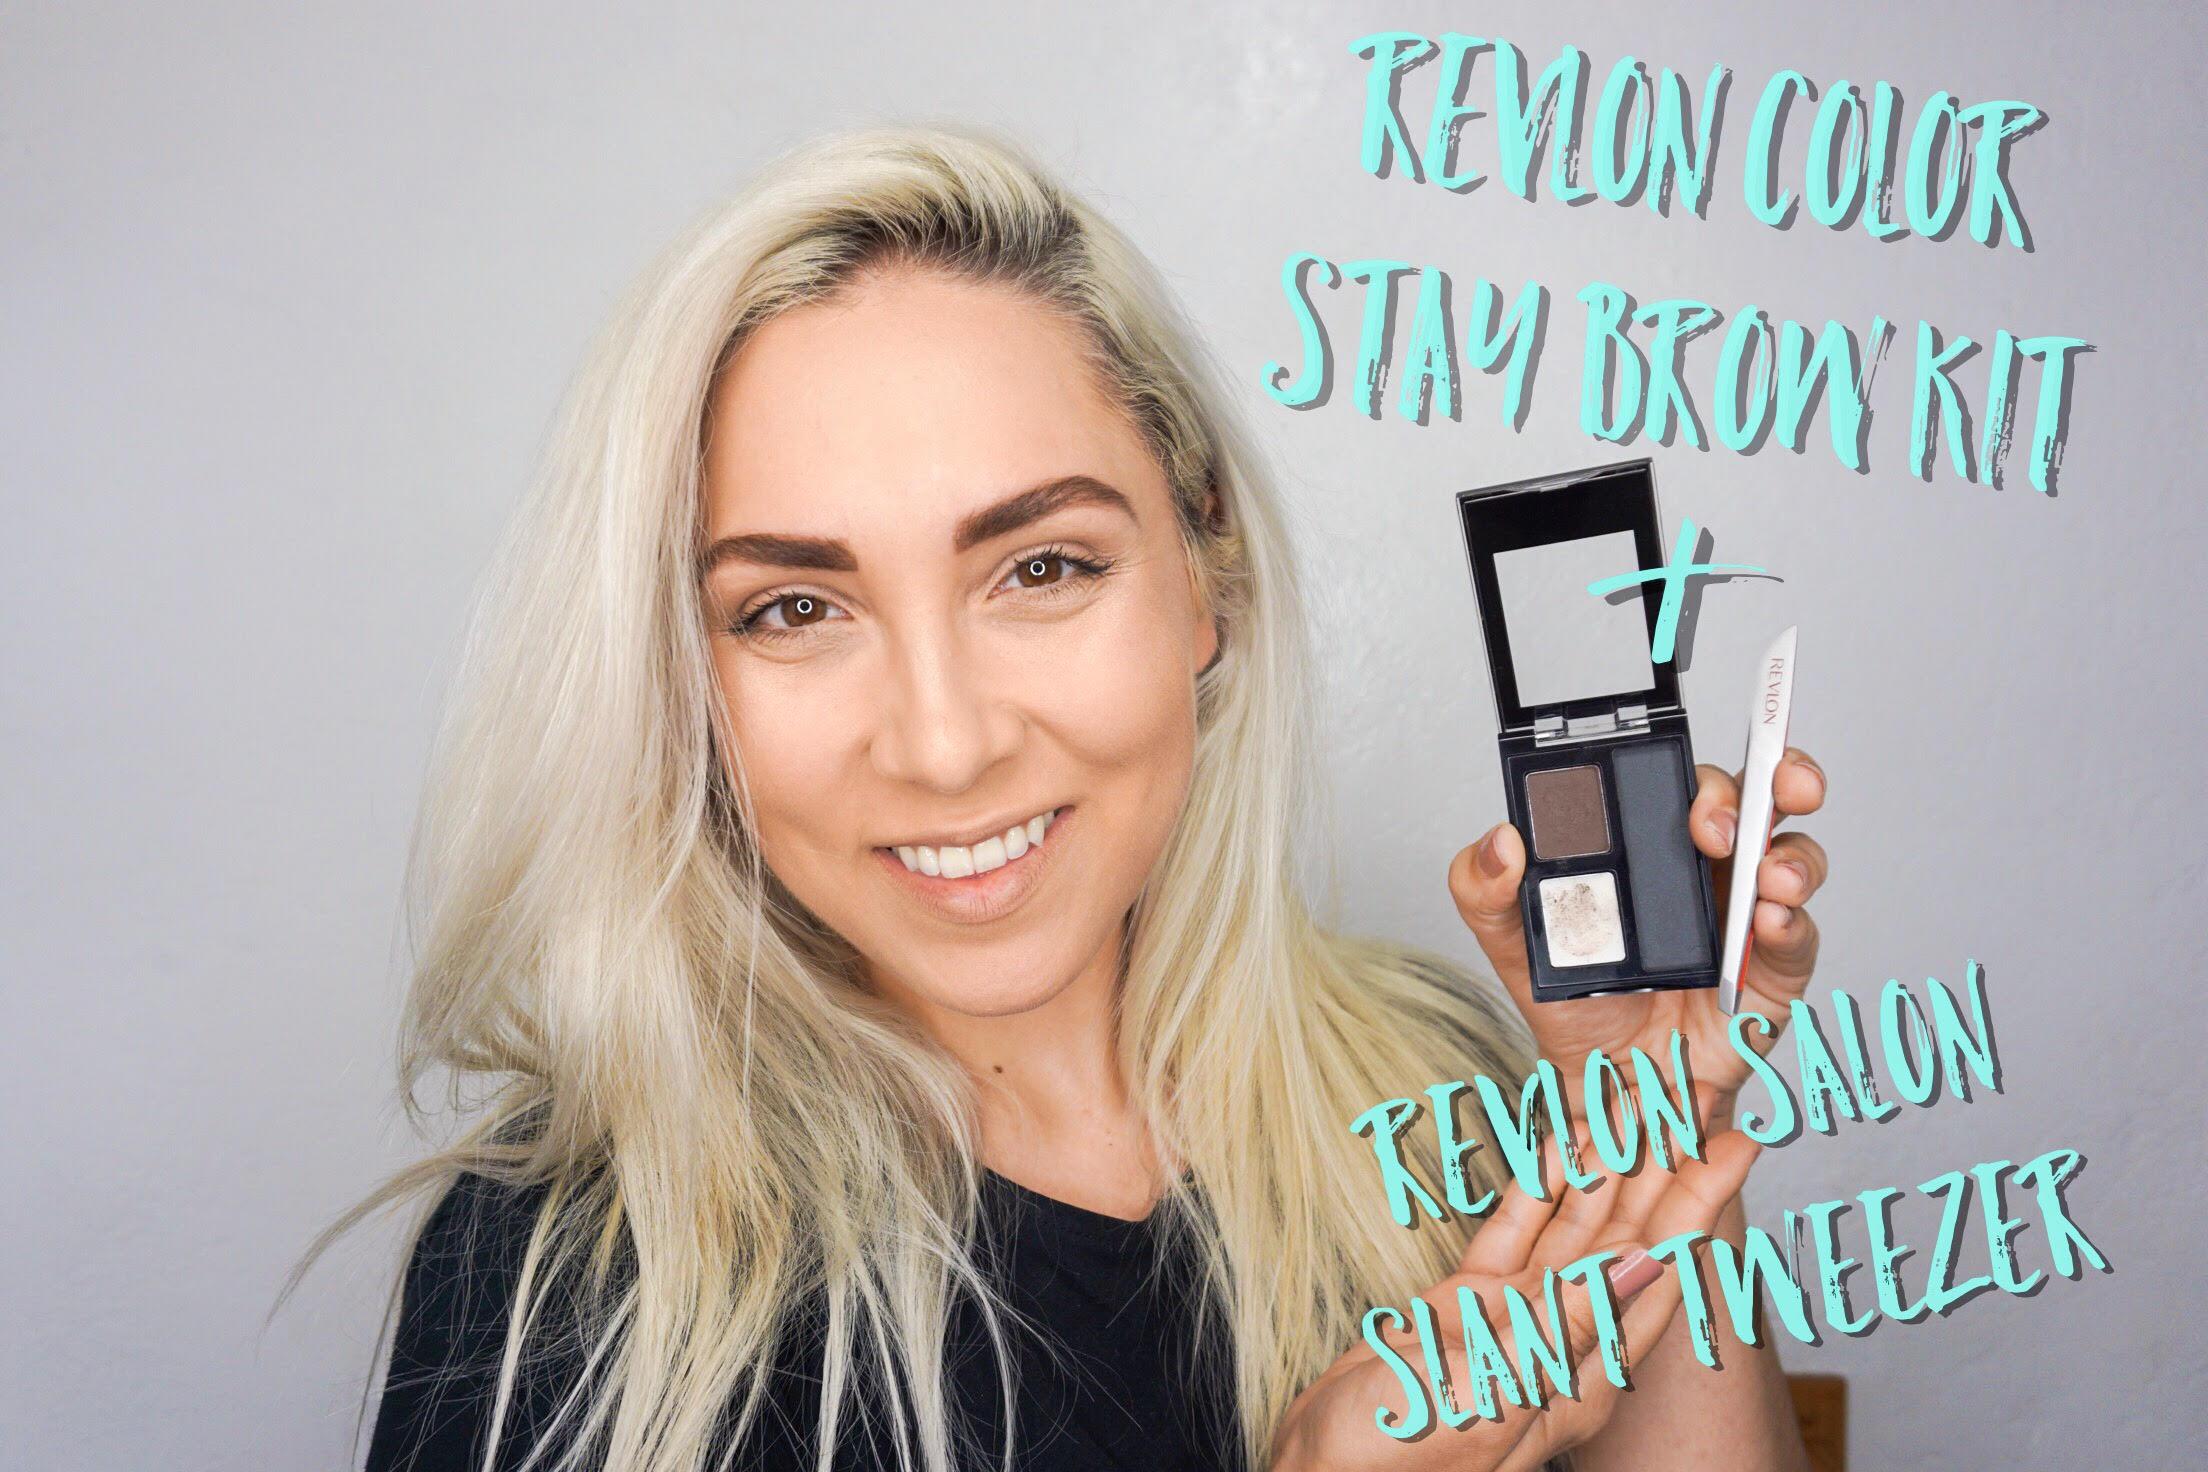 Revlon Color Stay Brow Kit &Salon Slant Tweezer:Product Use -